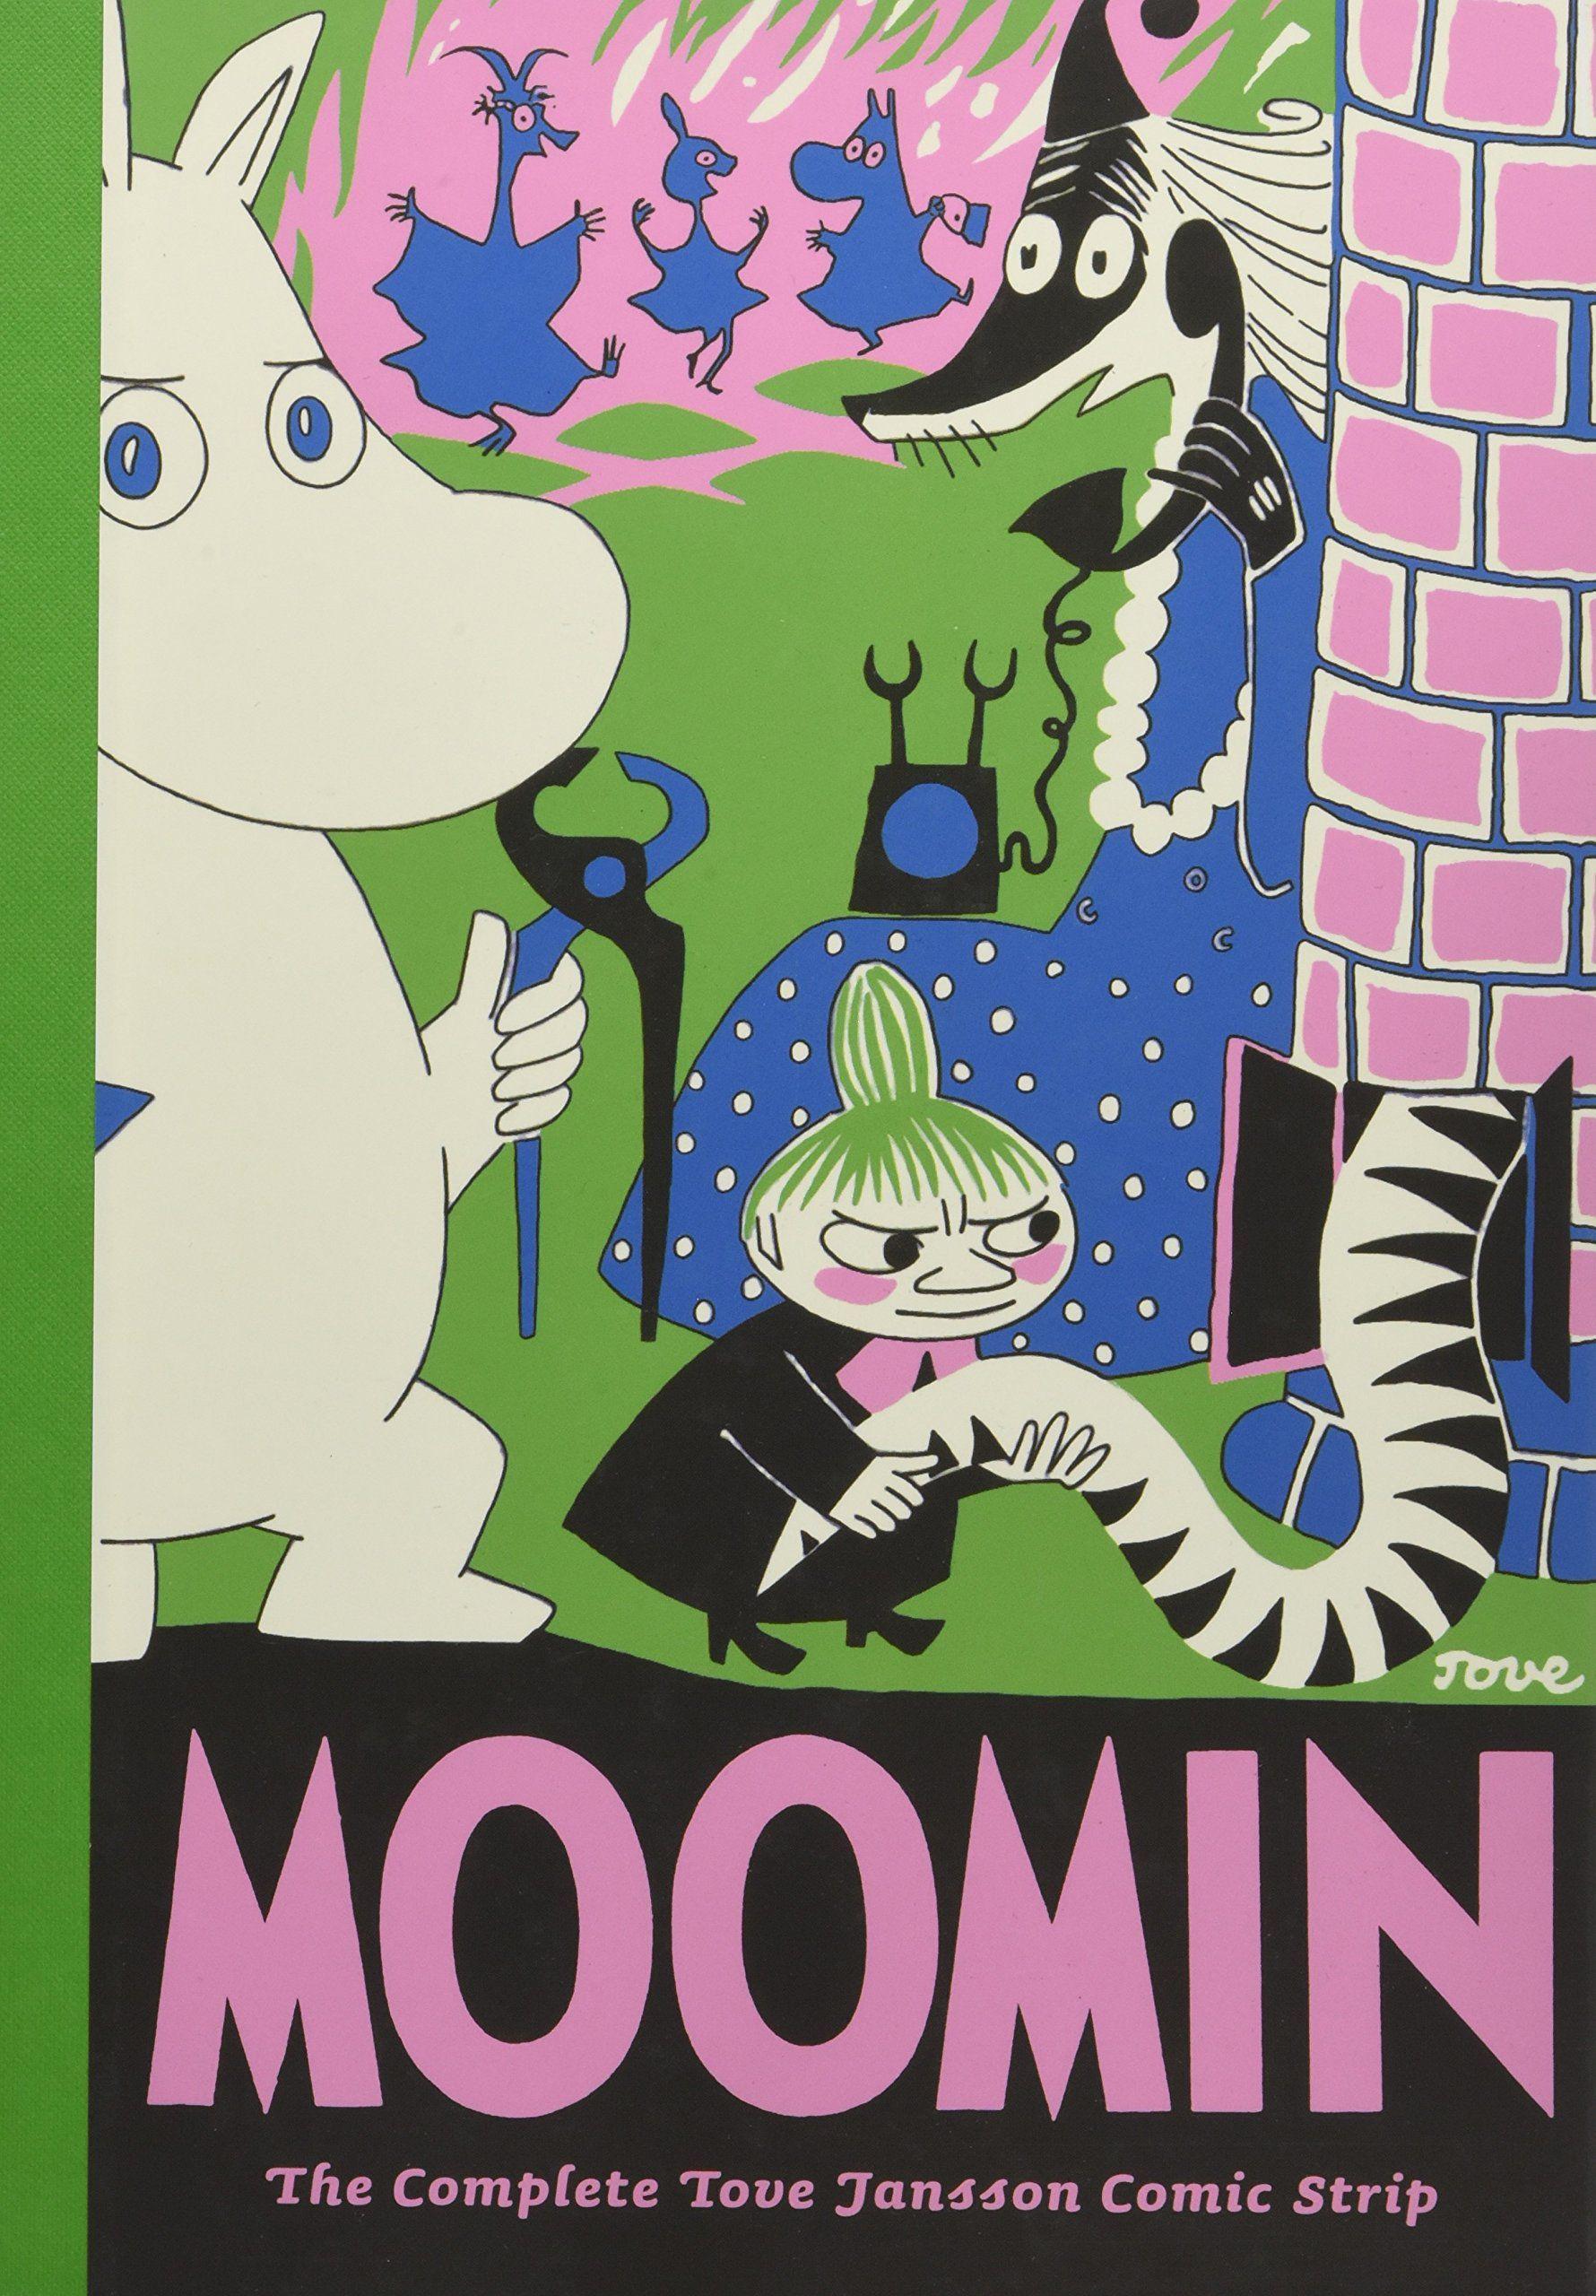 Moomin The Complete Tove Jansson Comic Strip